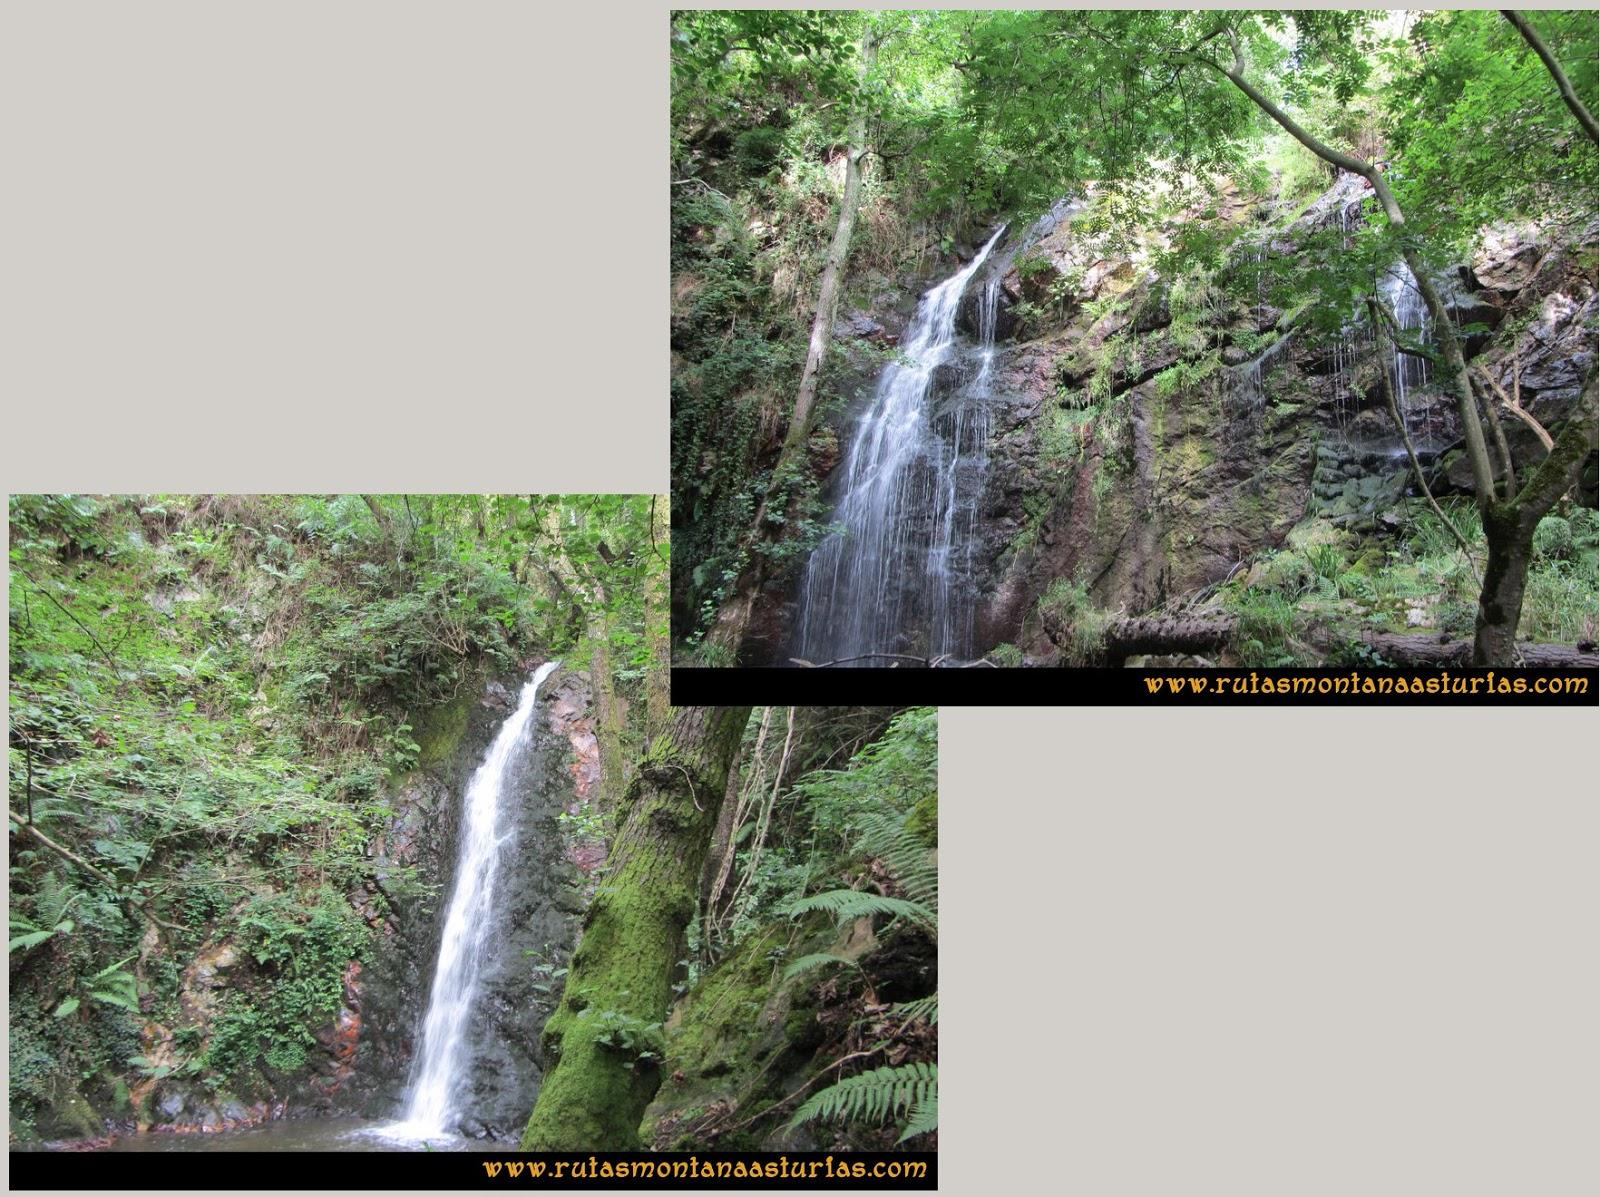 Ruta Cascadas Guanga, Castiello, el Oso: Segunda y tercera cascada